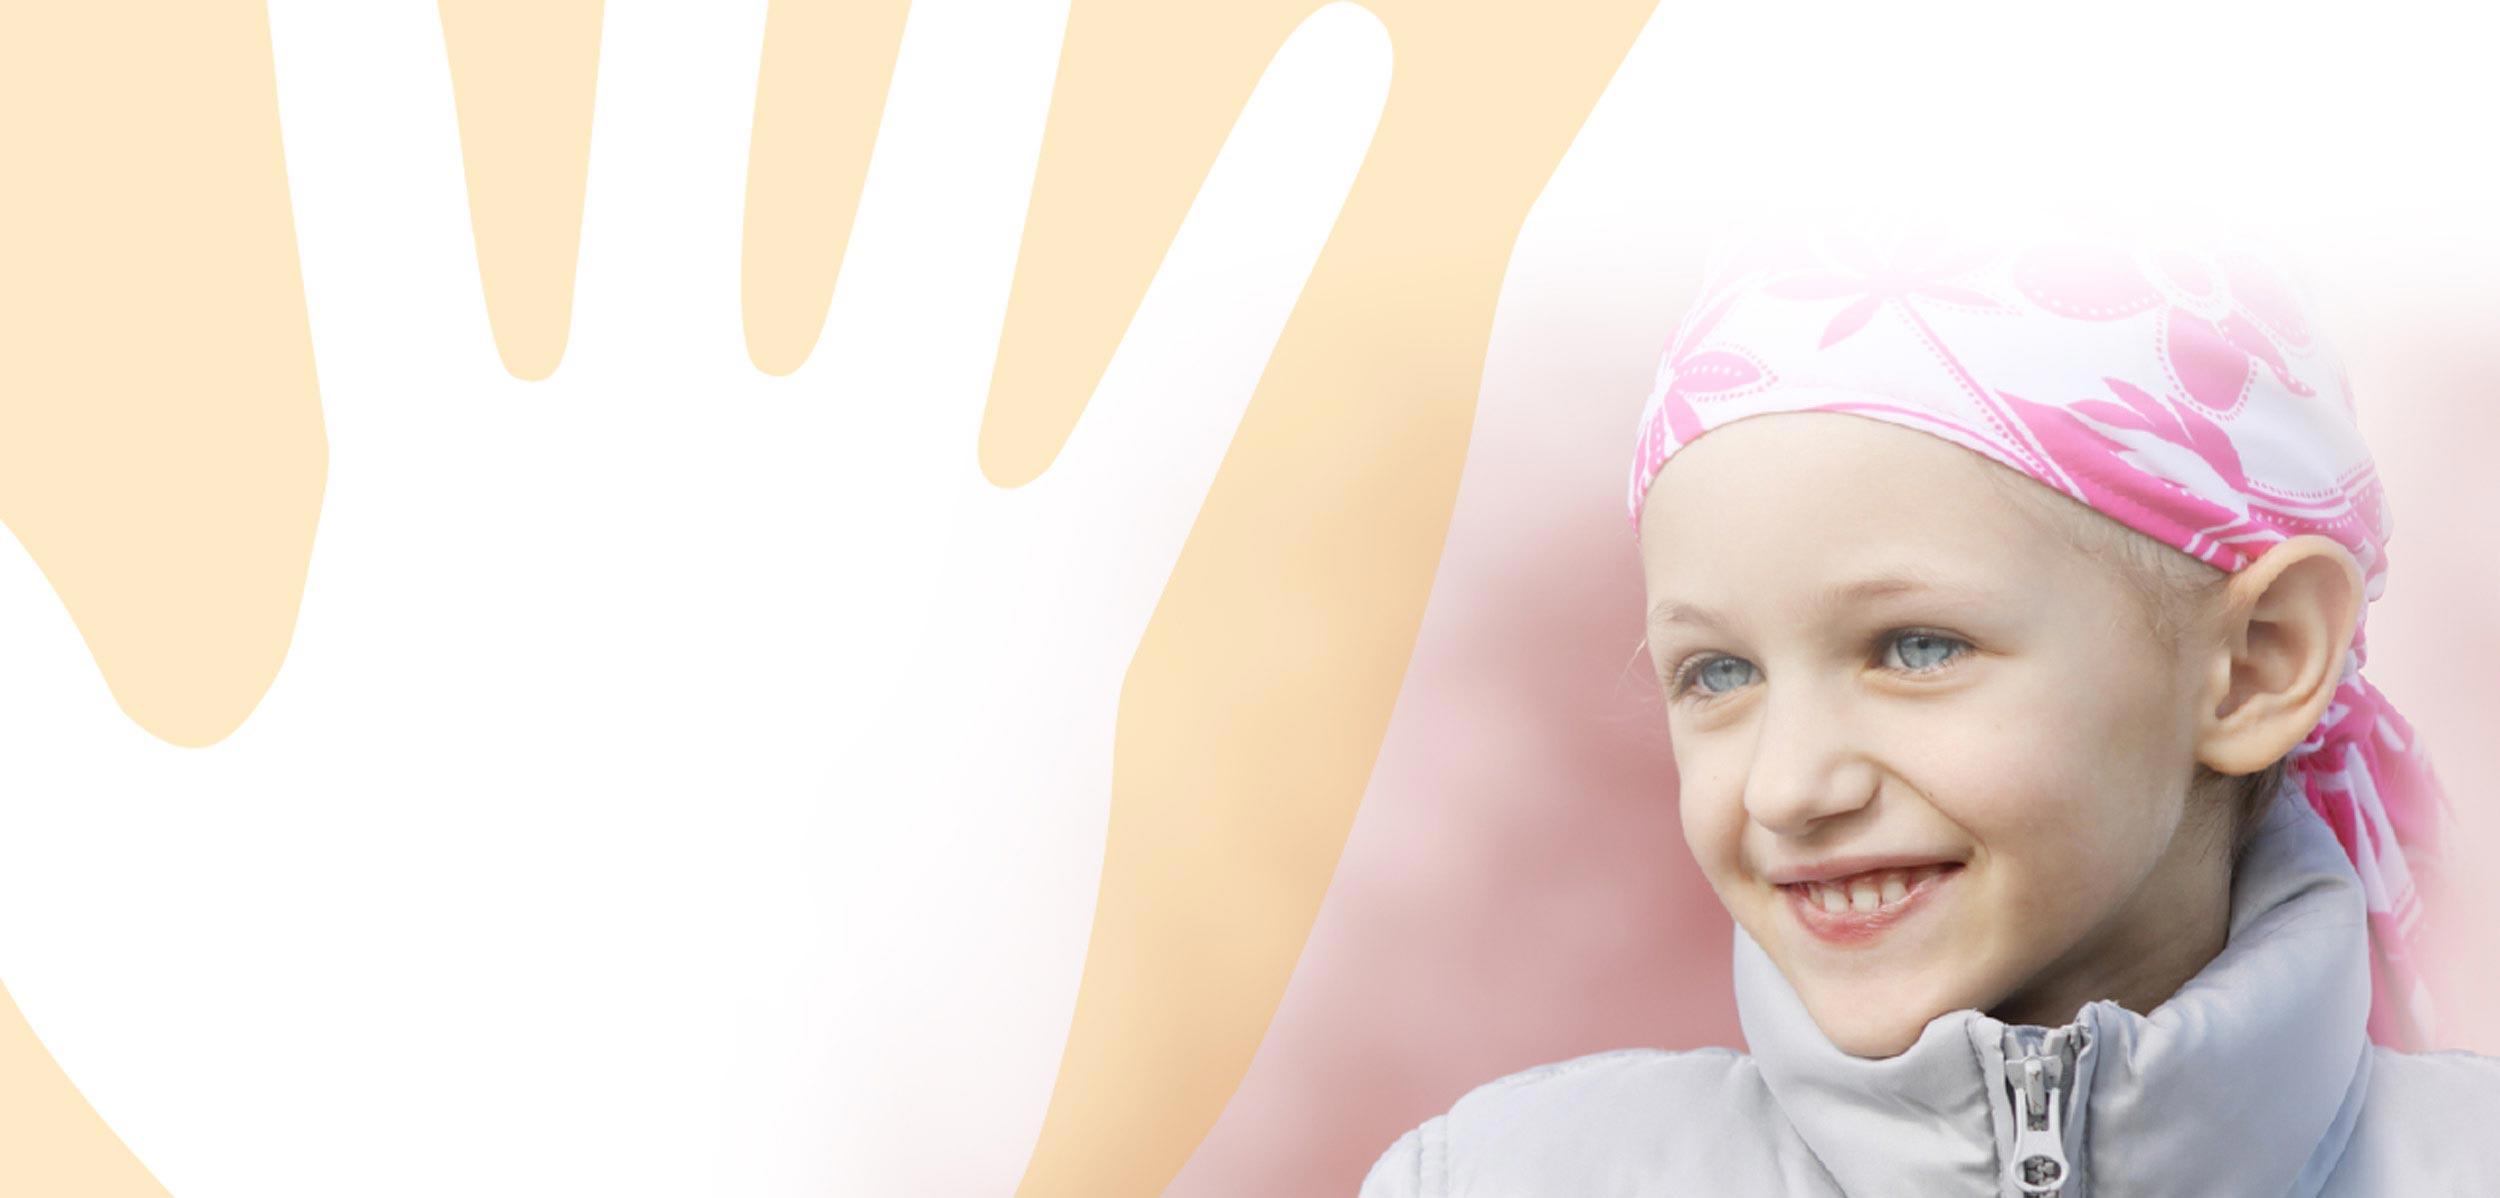 Pediatric Cancer Resources